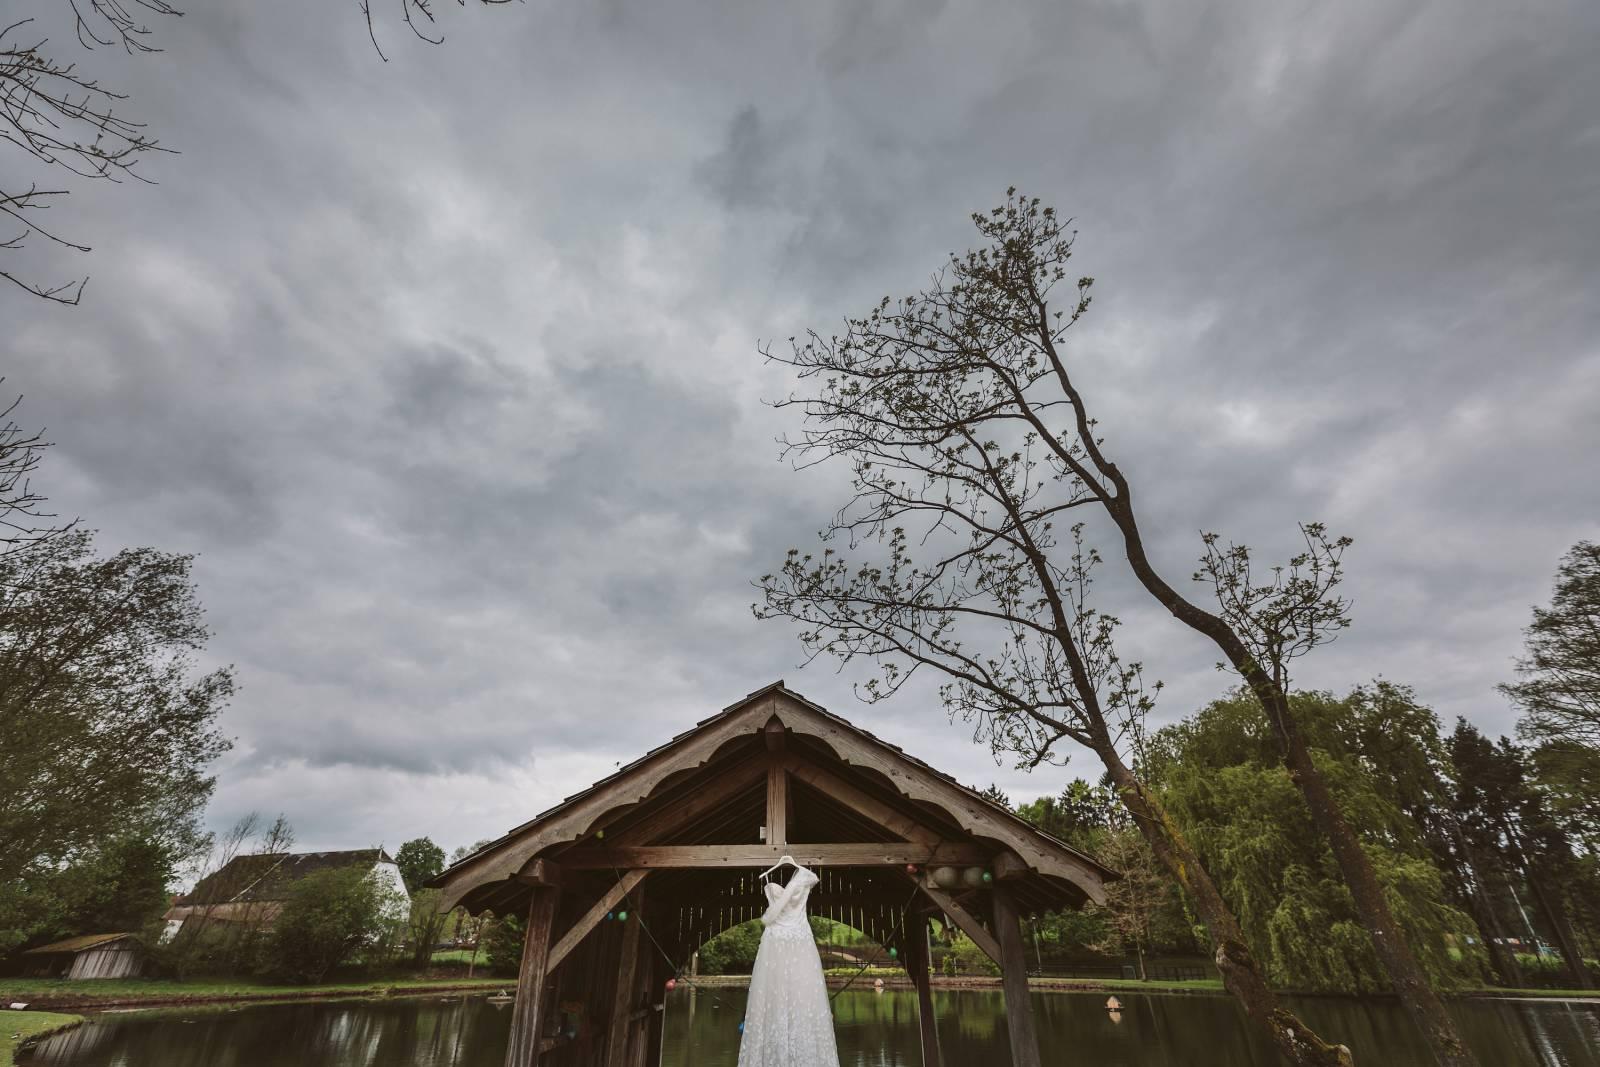 Be Your Guest - Wedding Planner - House of Weddings14-TENTE-2017-Antoine Melis